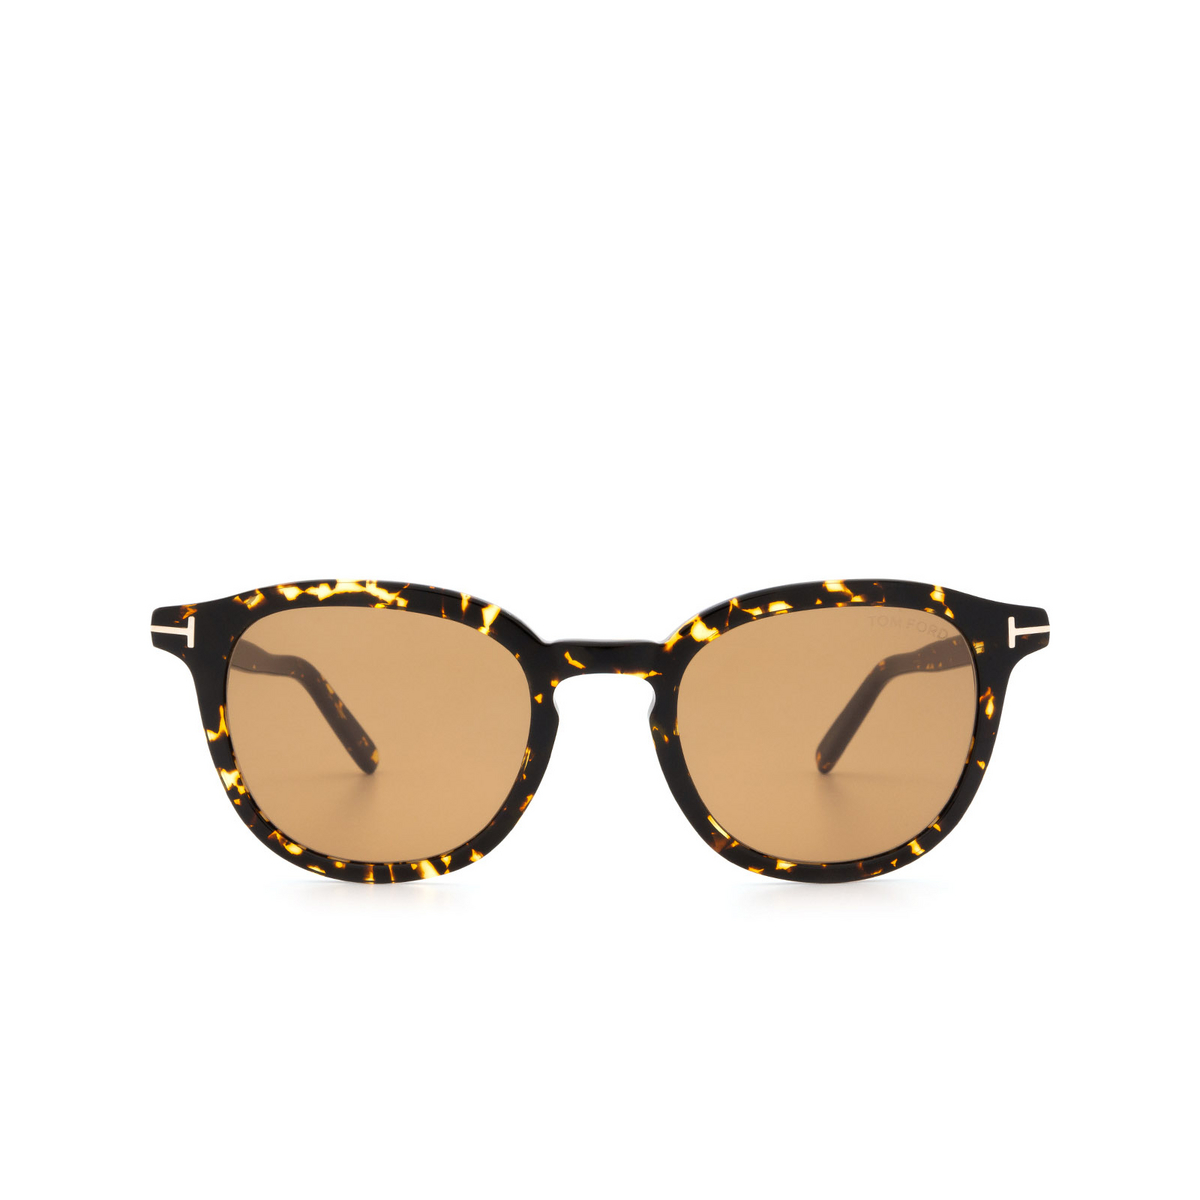 Tom Ford® Square Sunglasses: Pax FT0816 color Dark Havana 52E - front view.